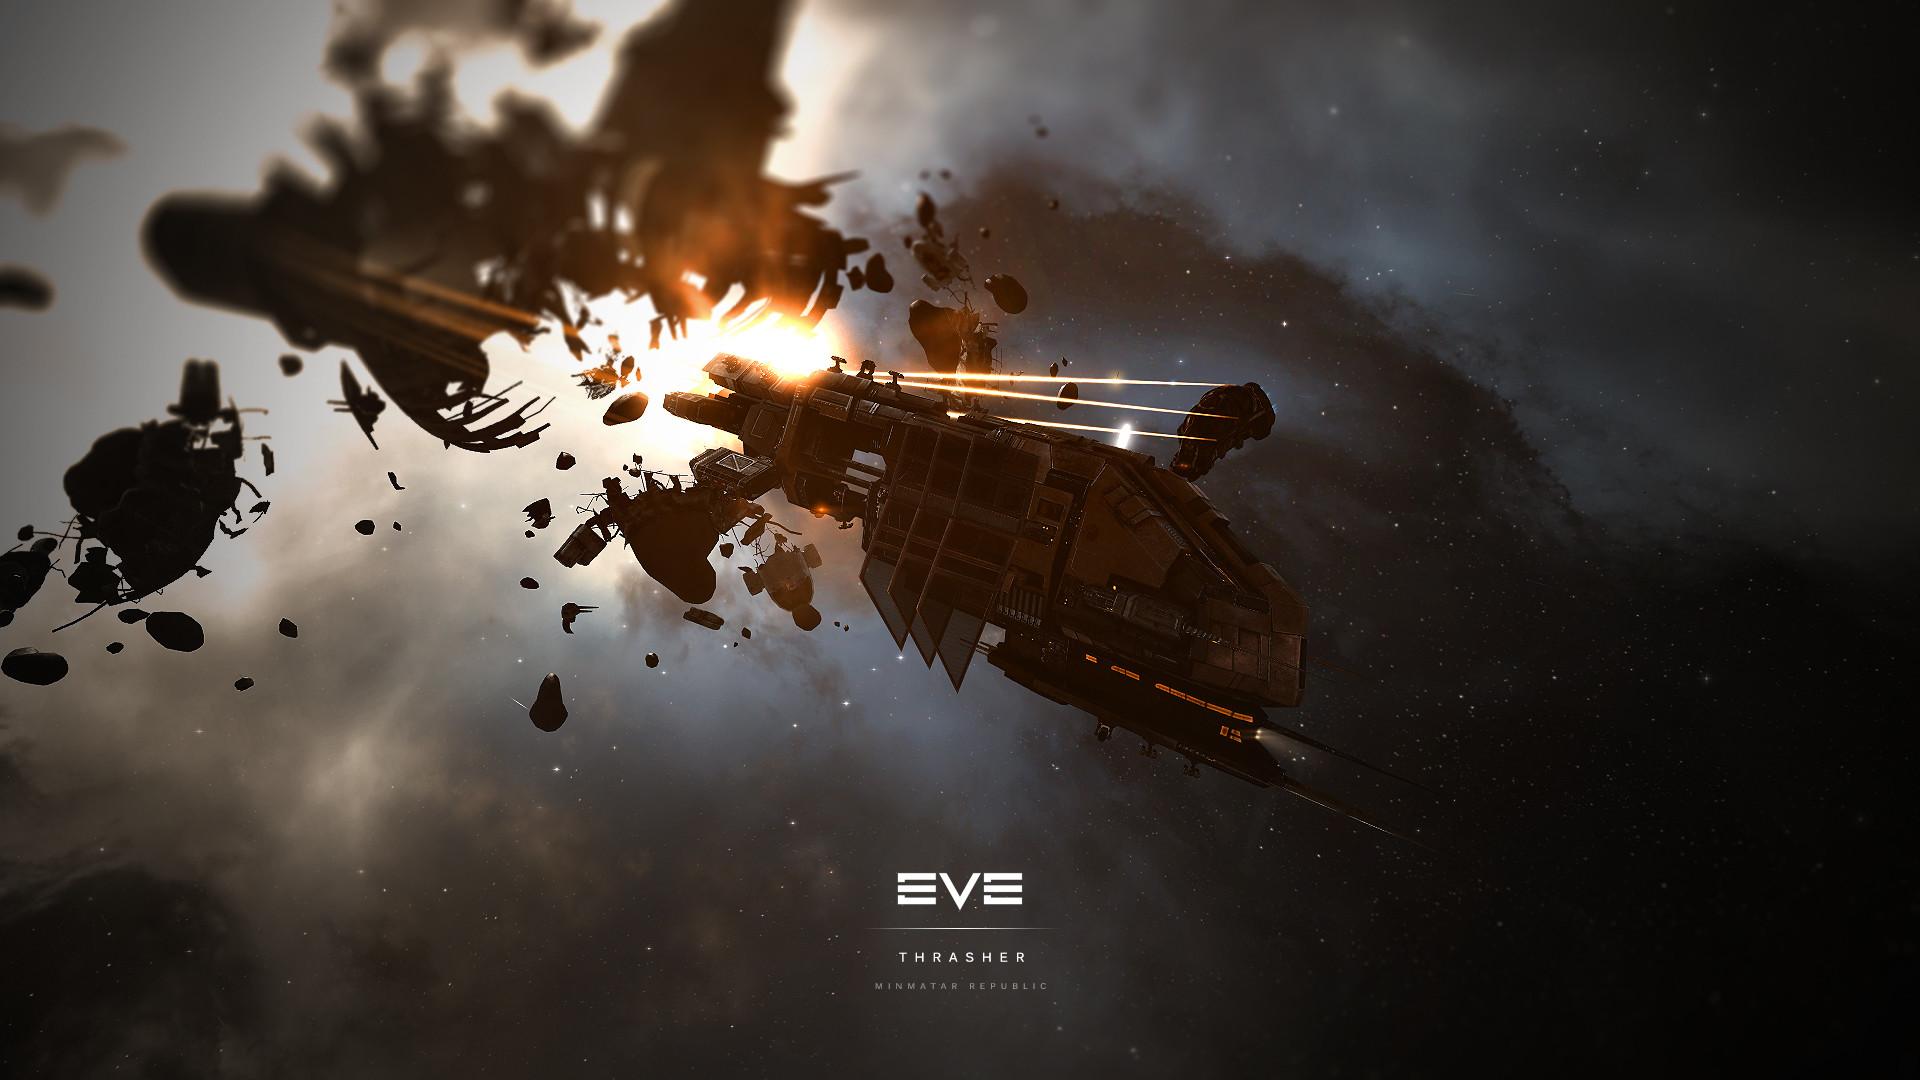 … EVE Online – Minmatar Republic Thrasher Wallpaper by MVestala